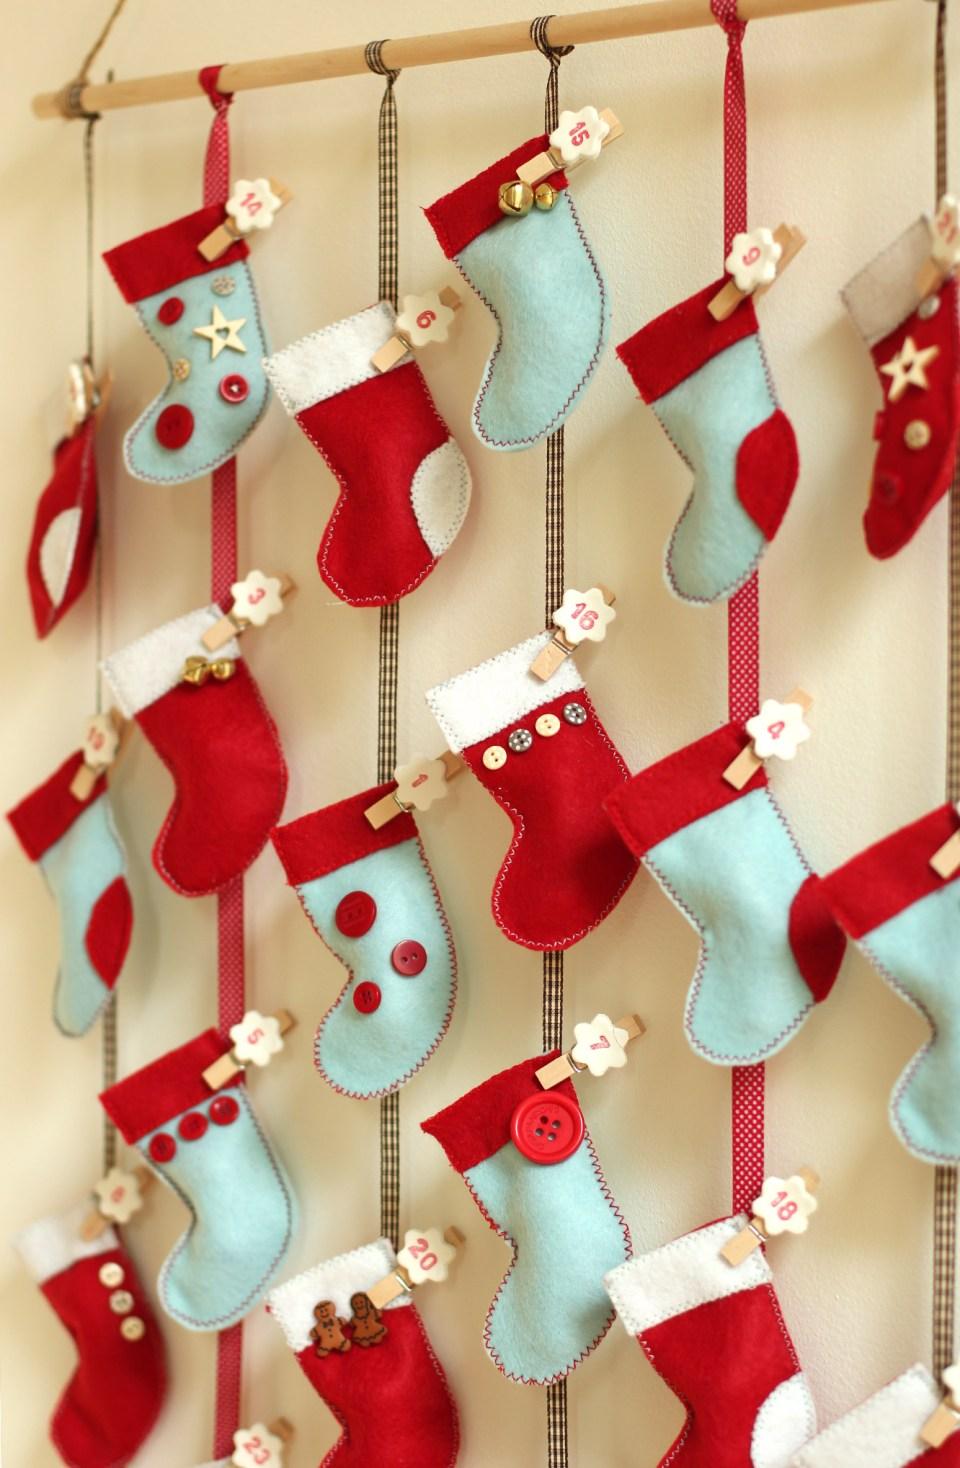 homemade-advent-calendar-mini-stockings-17